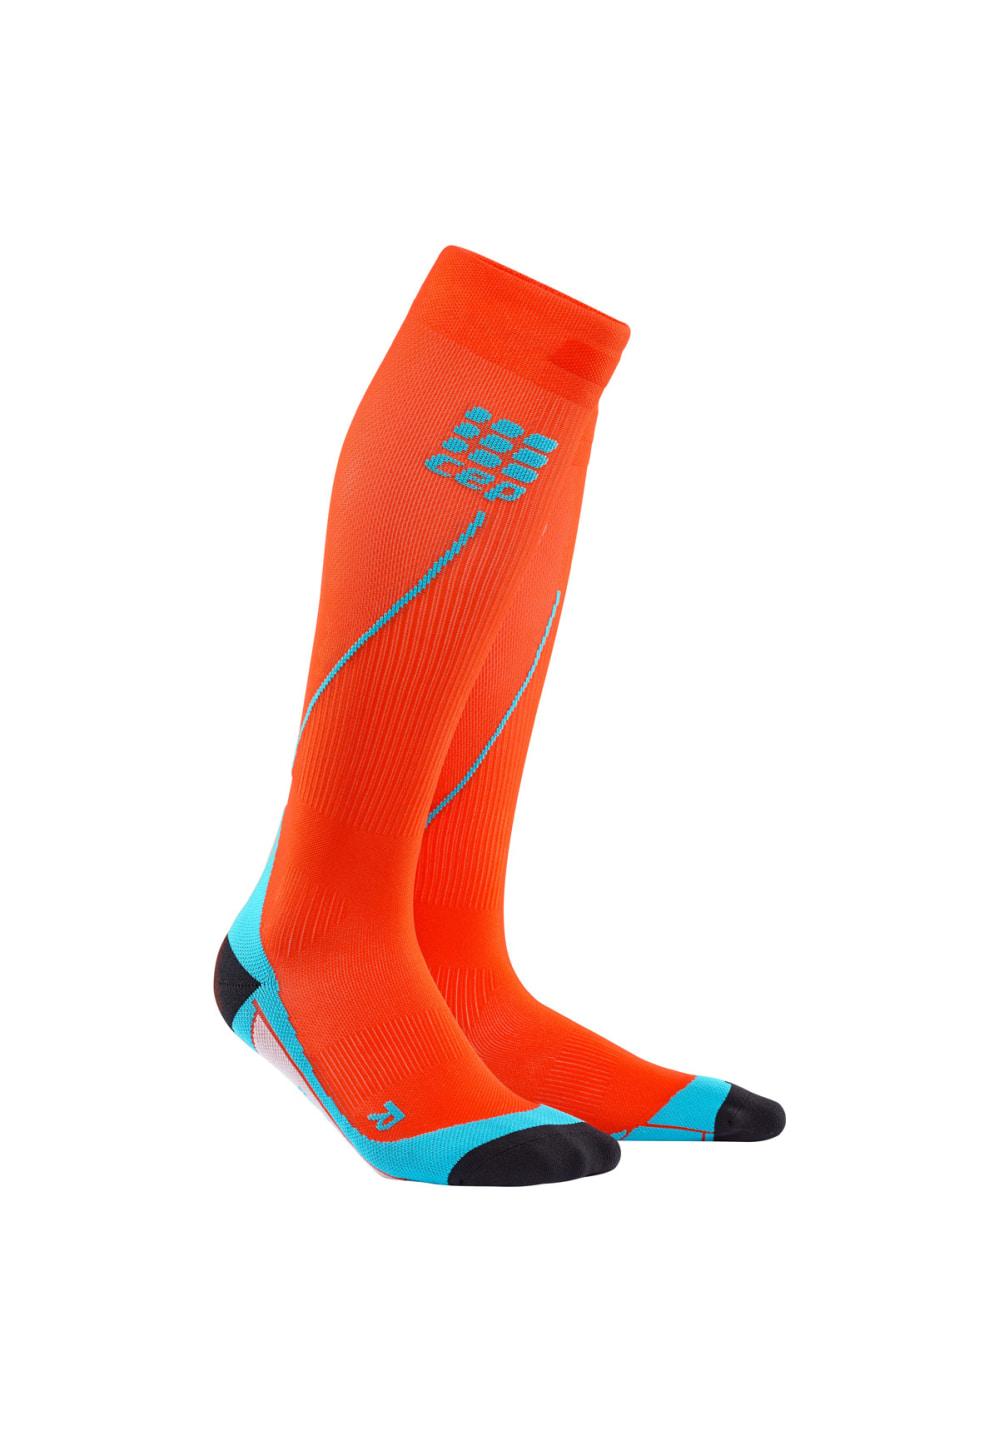 CEP Pro+ Run Socks 2.0 Kompression Herren 26.5-29 cm, Gr. 26.5-29 cm